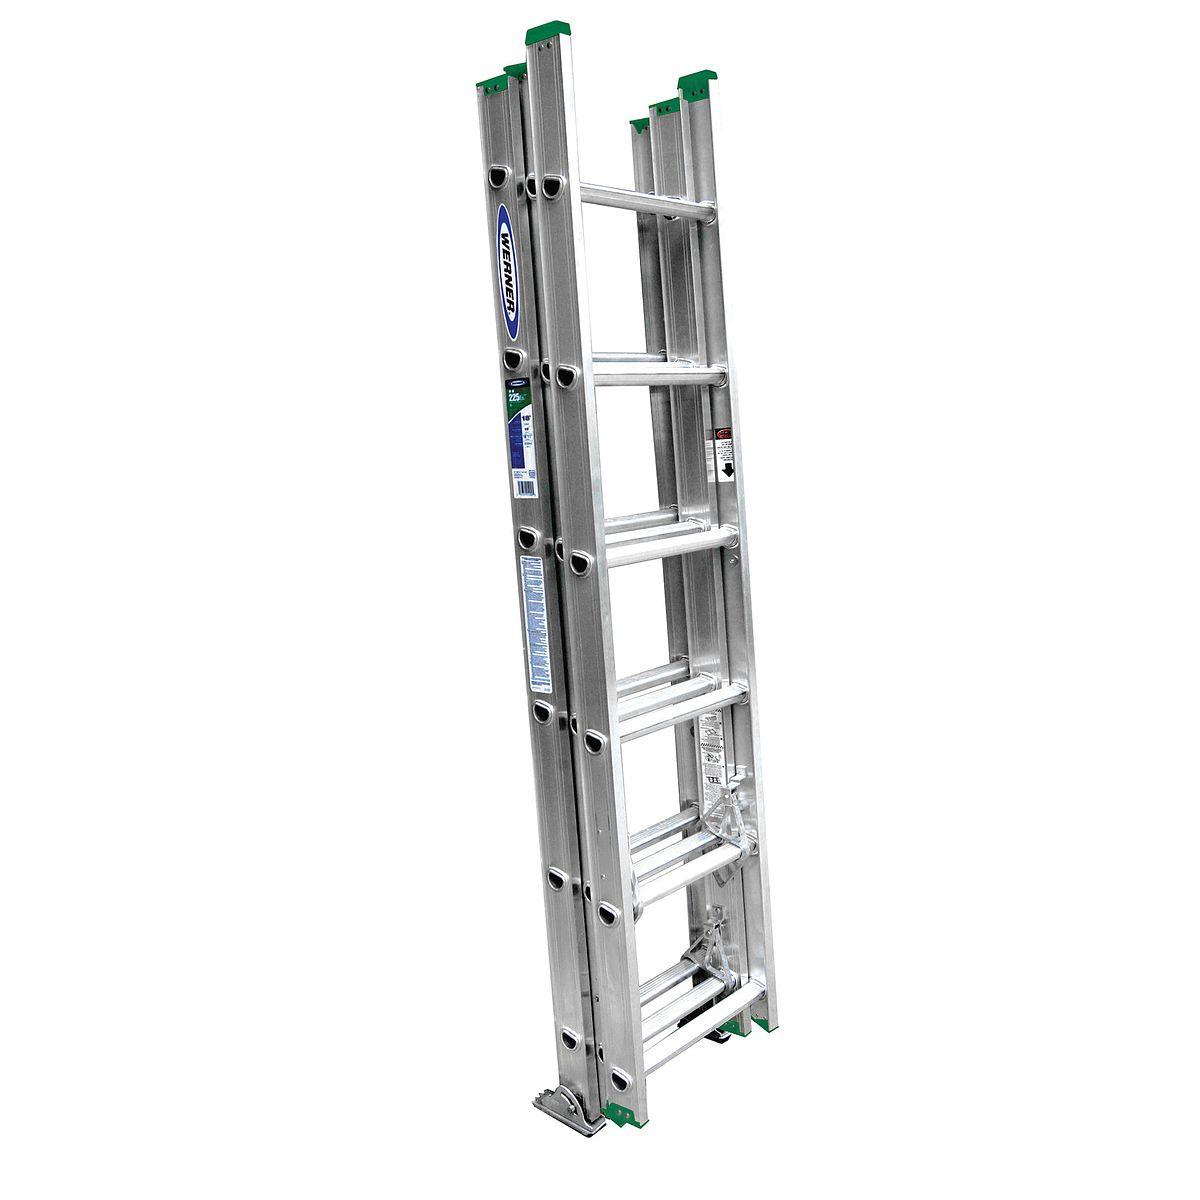 D1216 3 Extension Ladders Werner Us